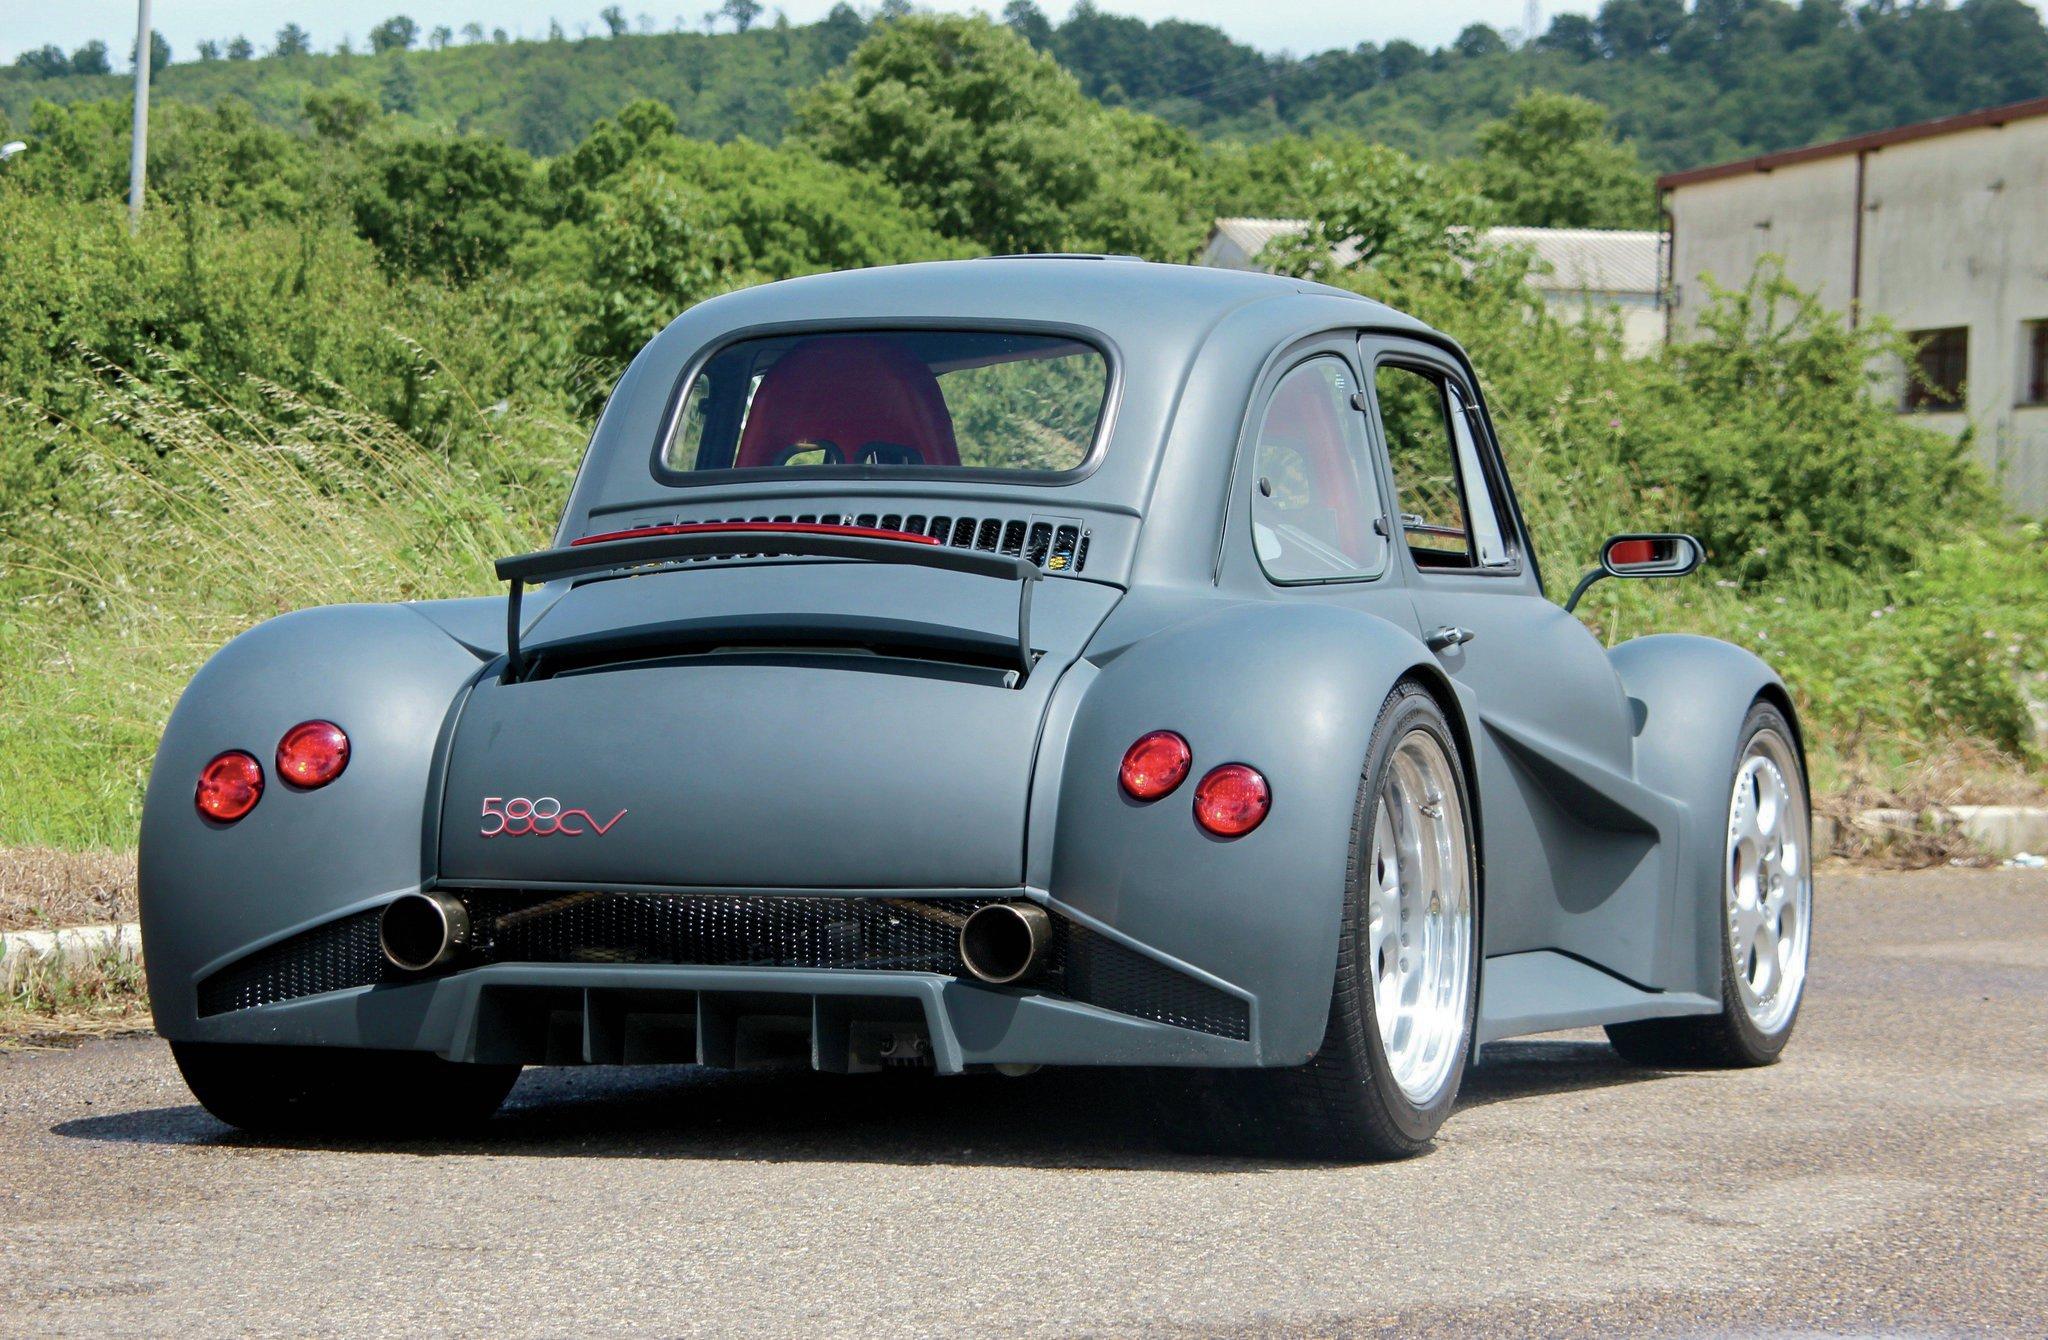 Wild Italians: The 580-HP, Lamborghini V-12-Powered Fiat 500